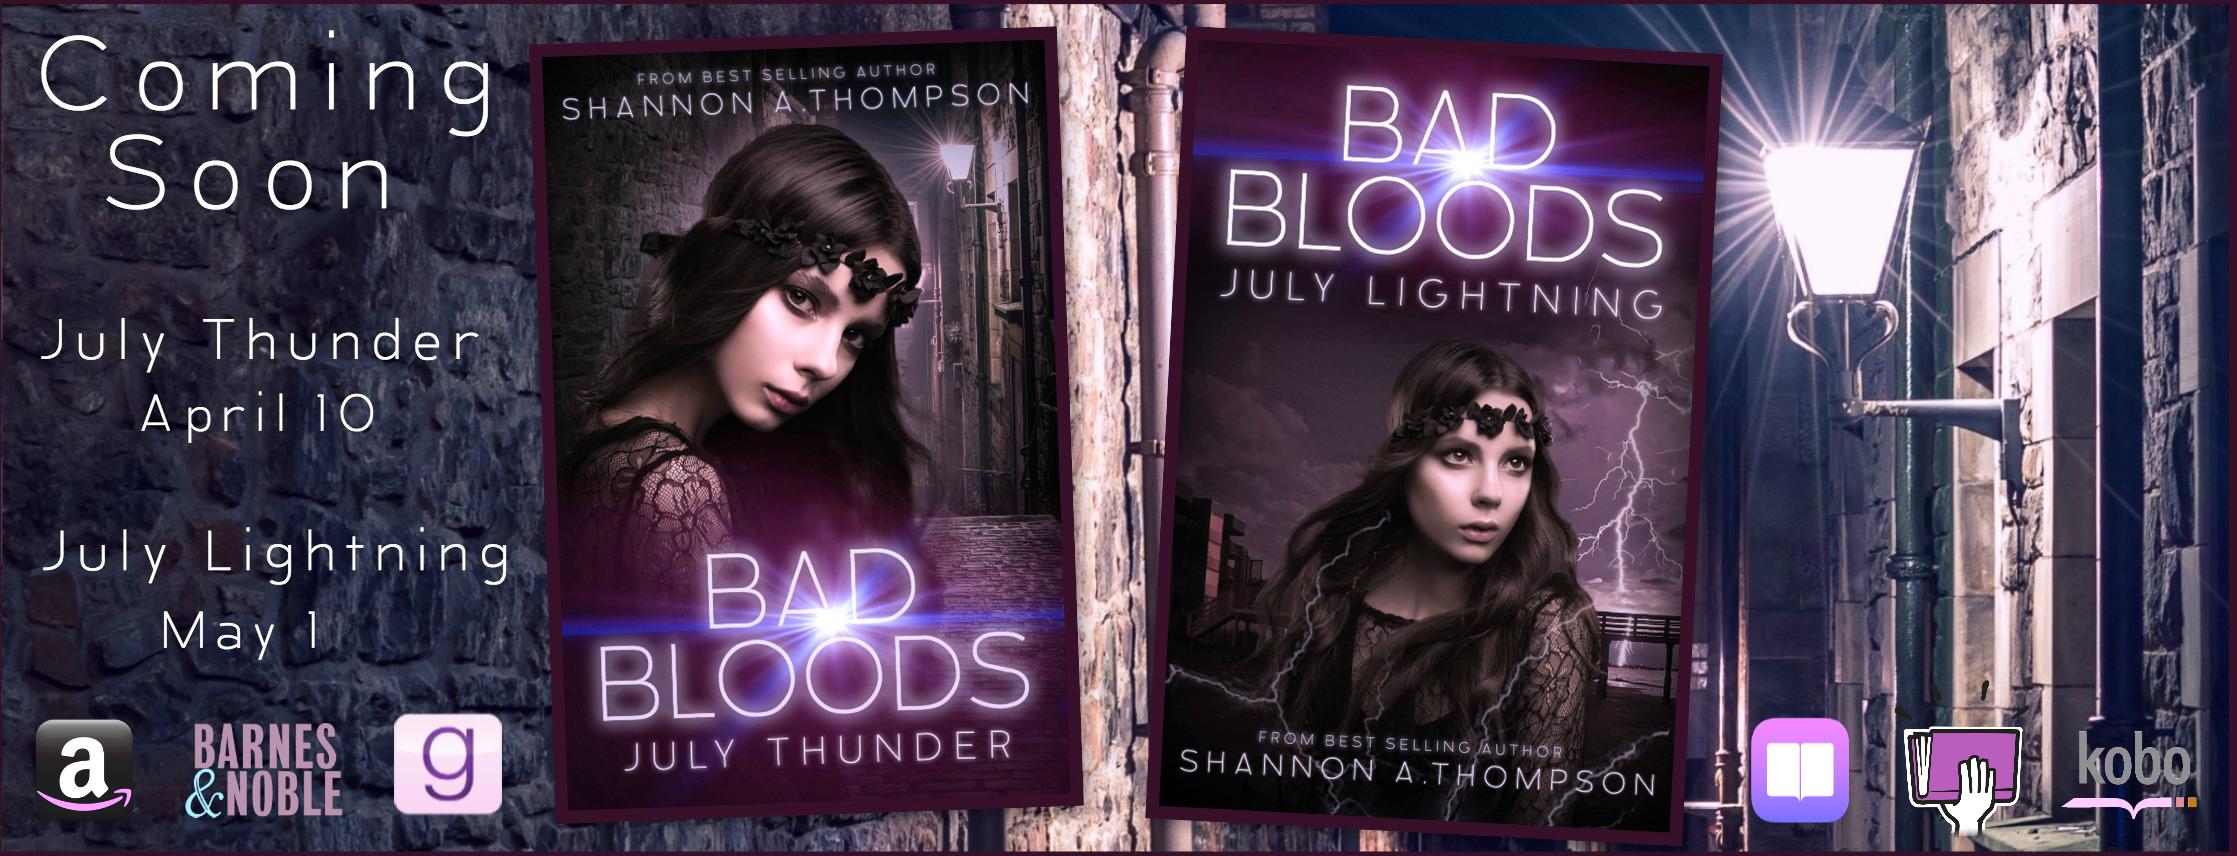 Bad Bloods: July Thunder and Bad Bloods: July Lightning